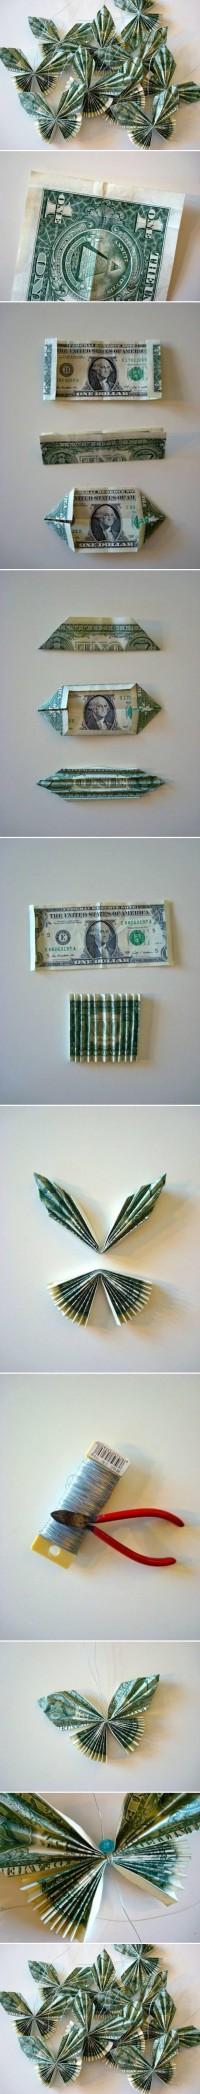 DIY Money Bill Butterfly DIY Projects | UsefulDIY.com